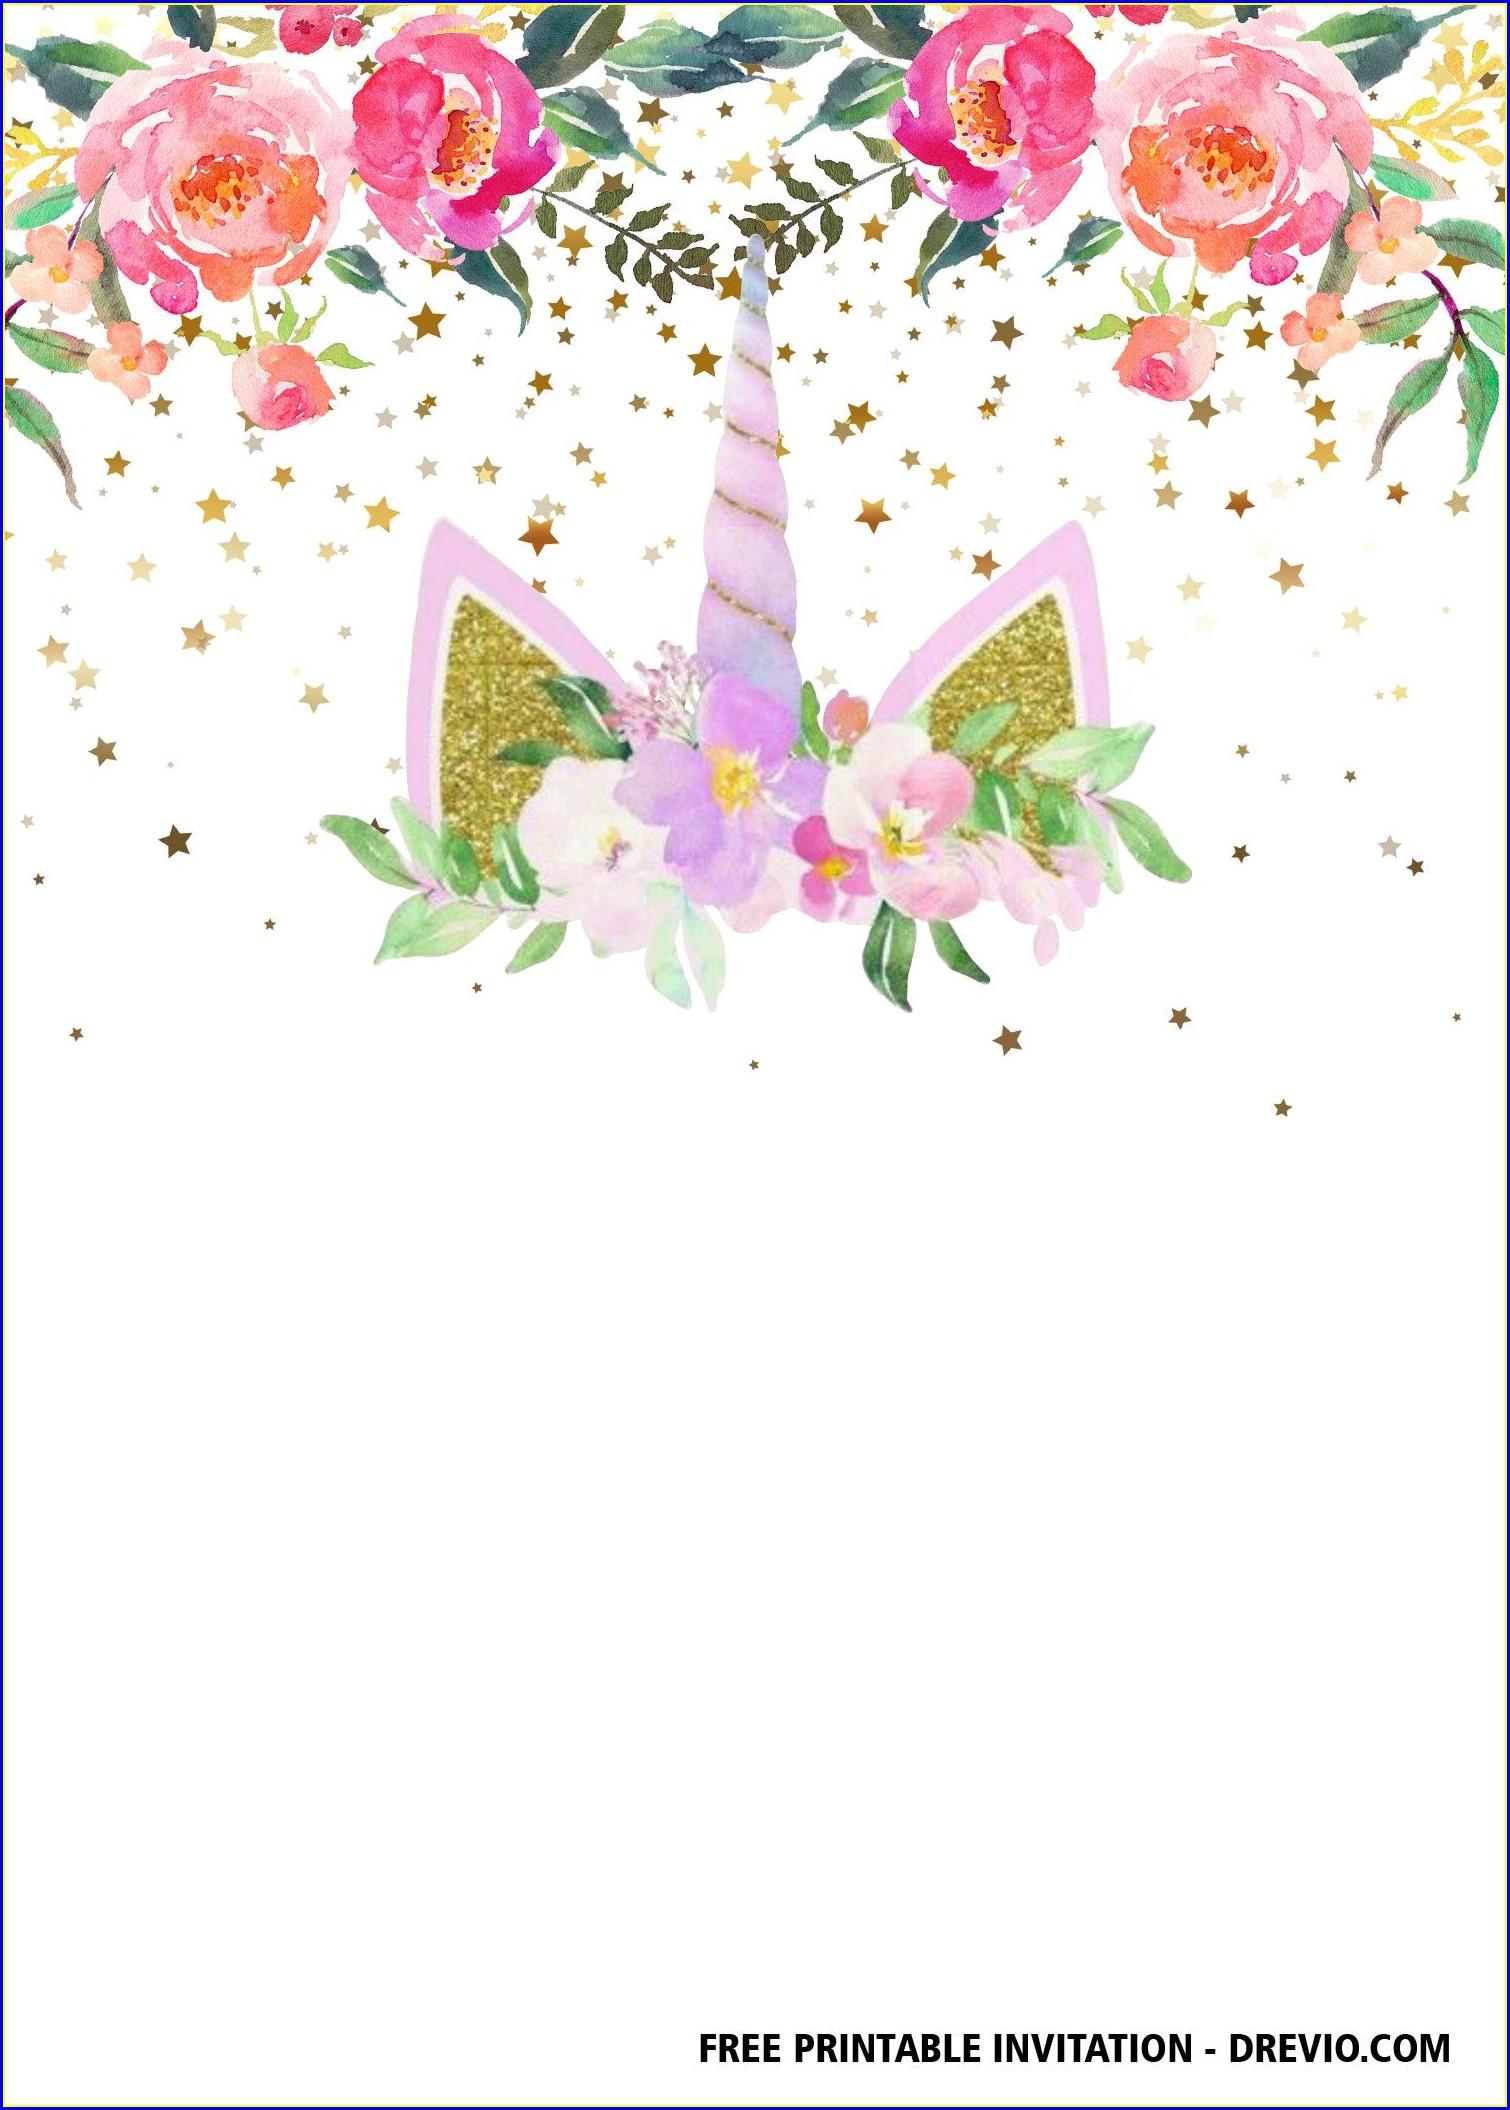 Free Printable Unicorn Invitations Templates